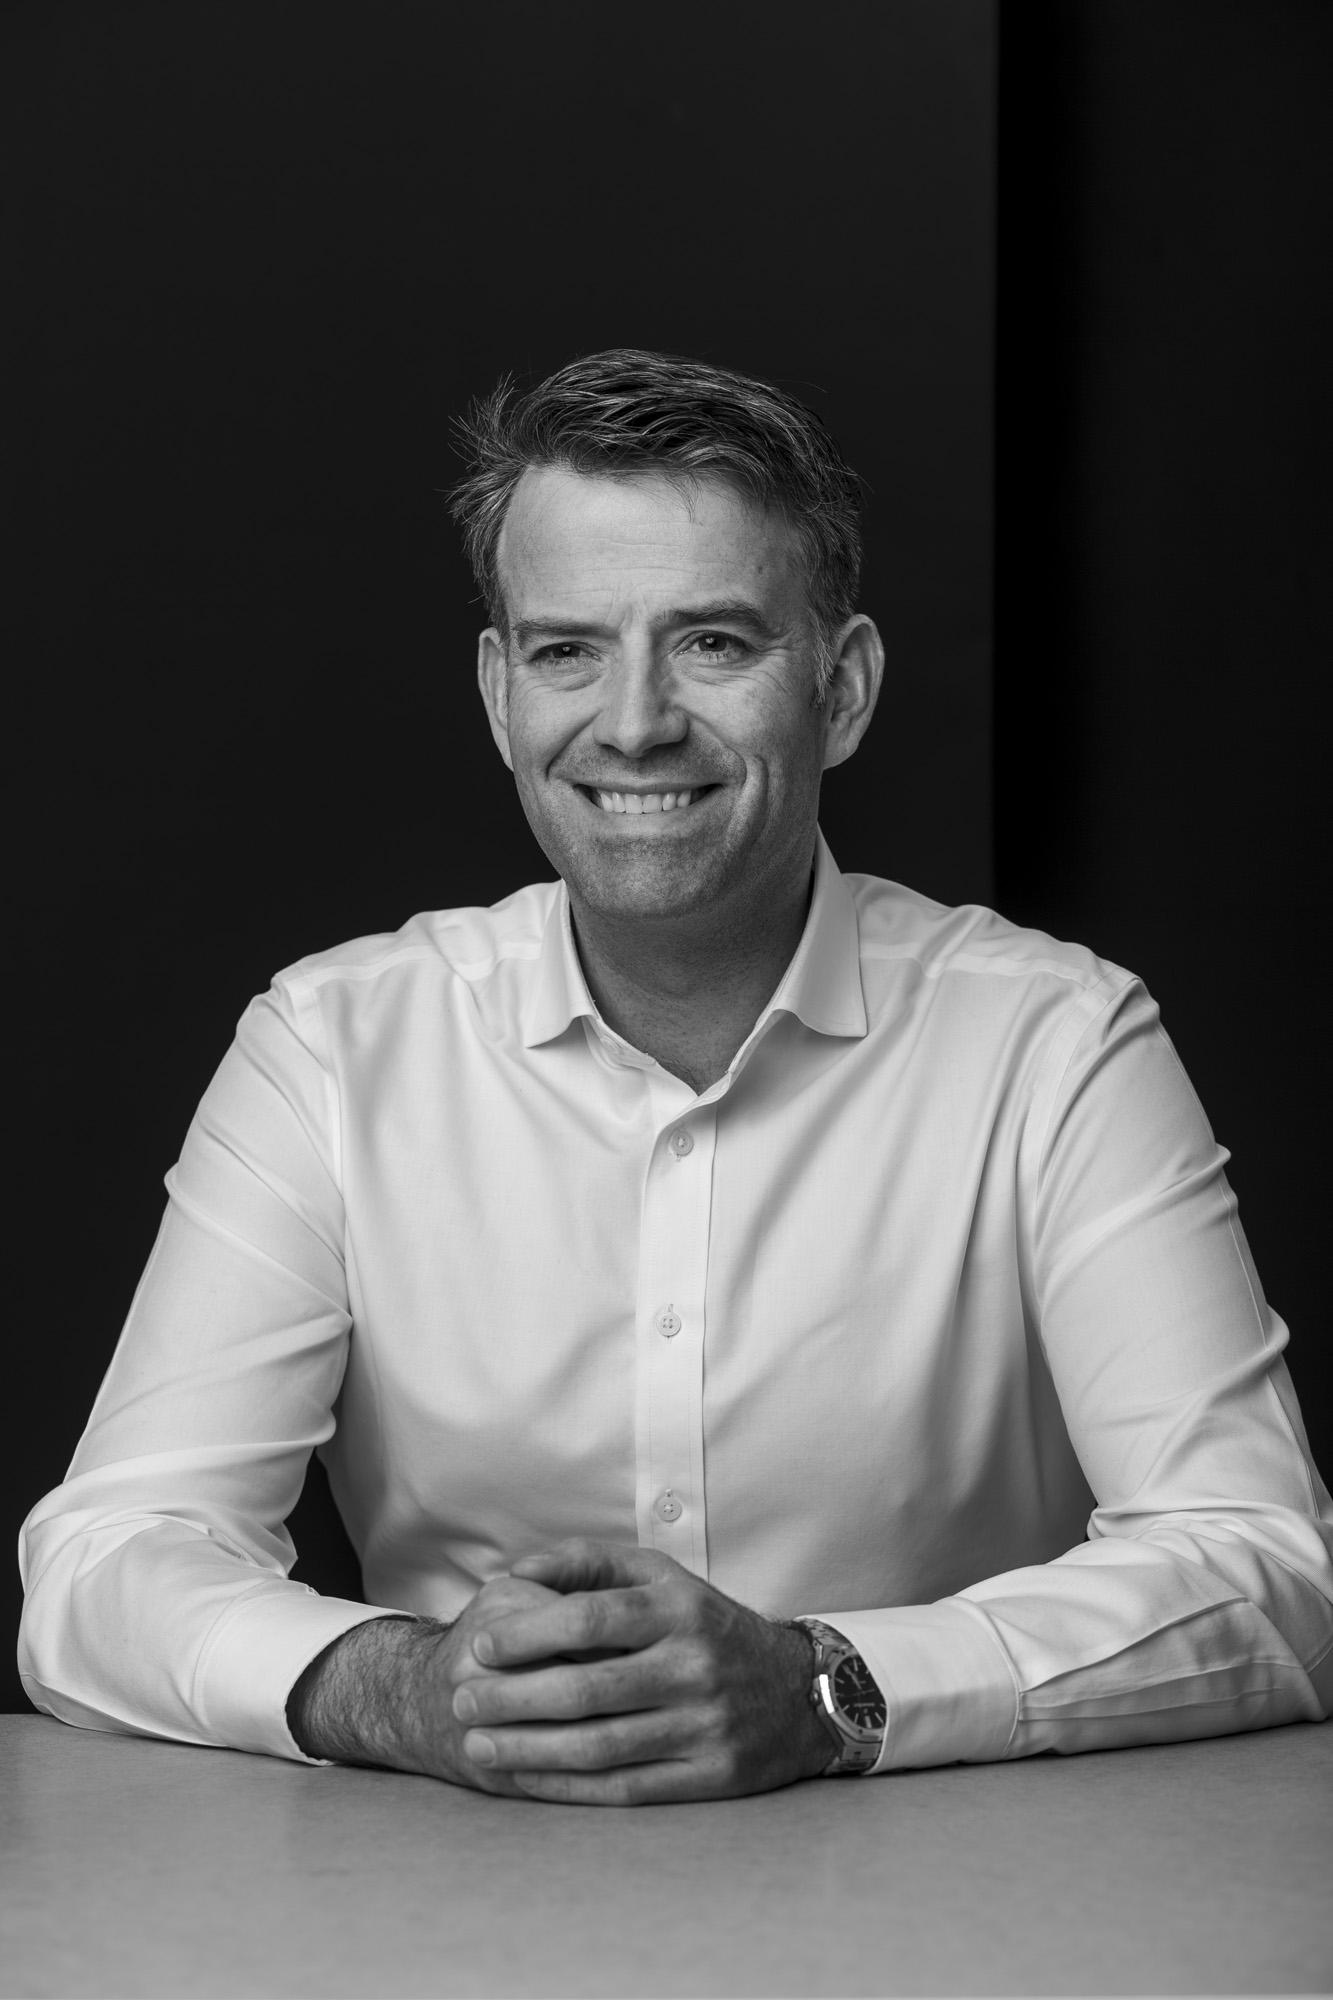 Carsten Bornemann